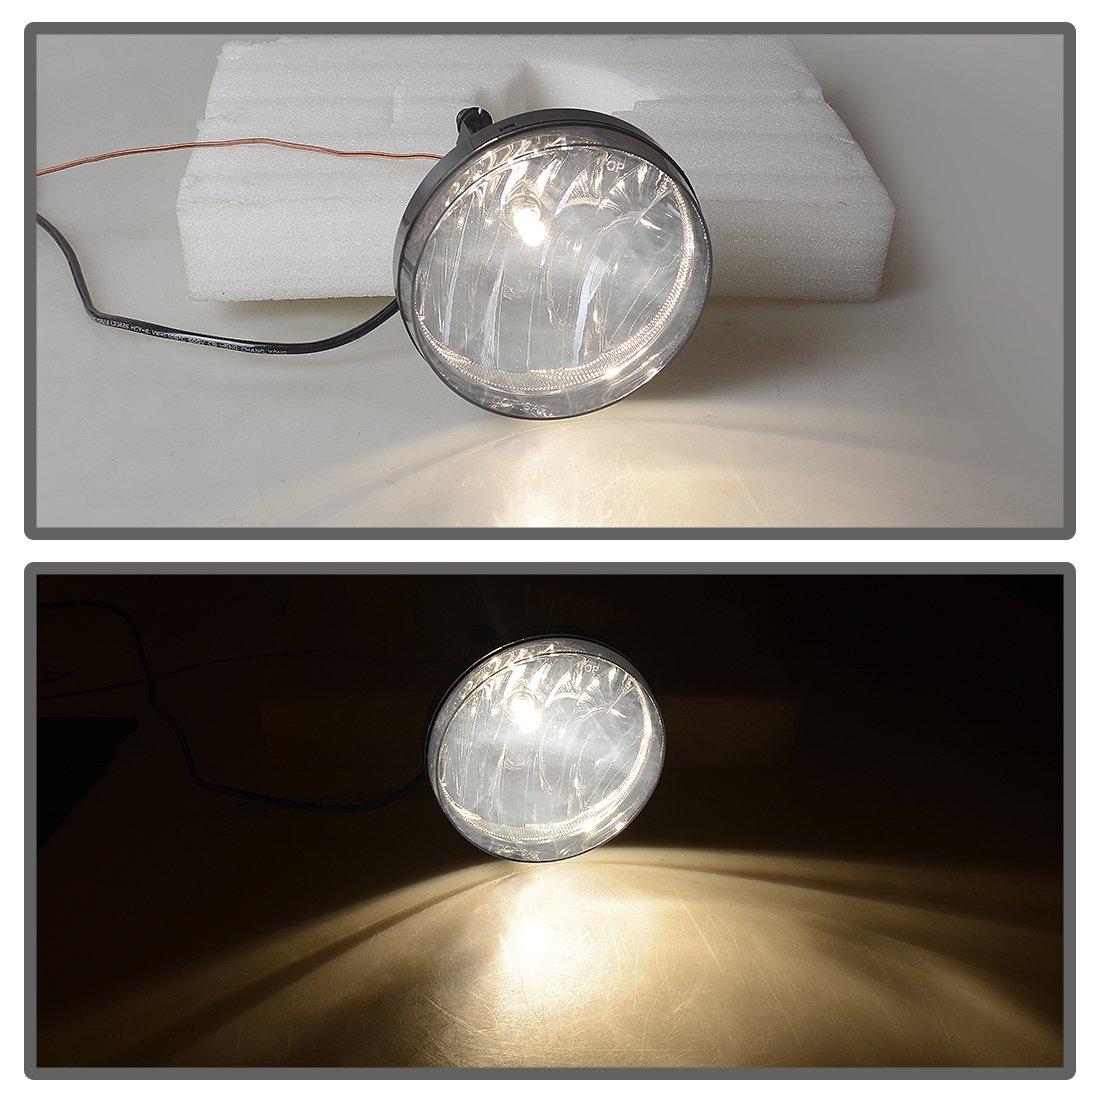 OE Style Clear lens w// 5202 PS 12V 37.5W Bulbs Fog Lights For GMC Sierra 1500 2007-2013 Sierra 2500 3500 2007-2014